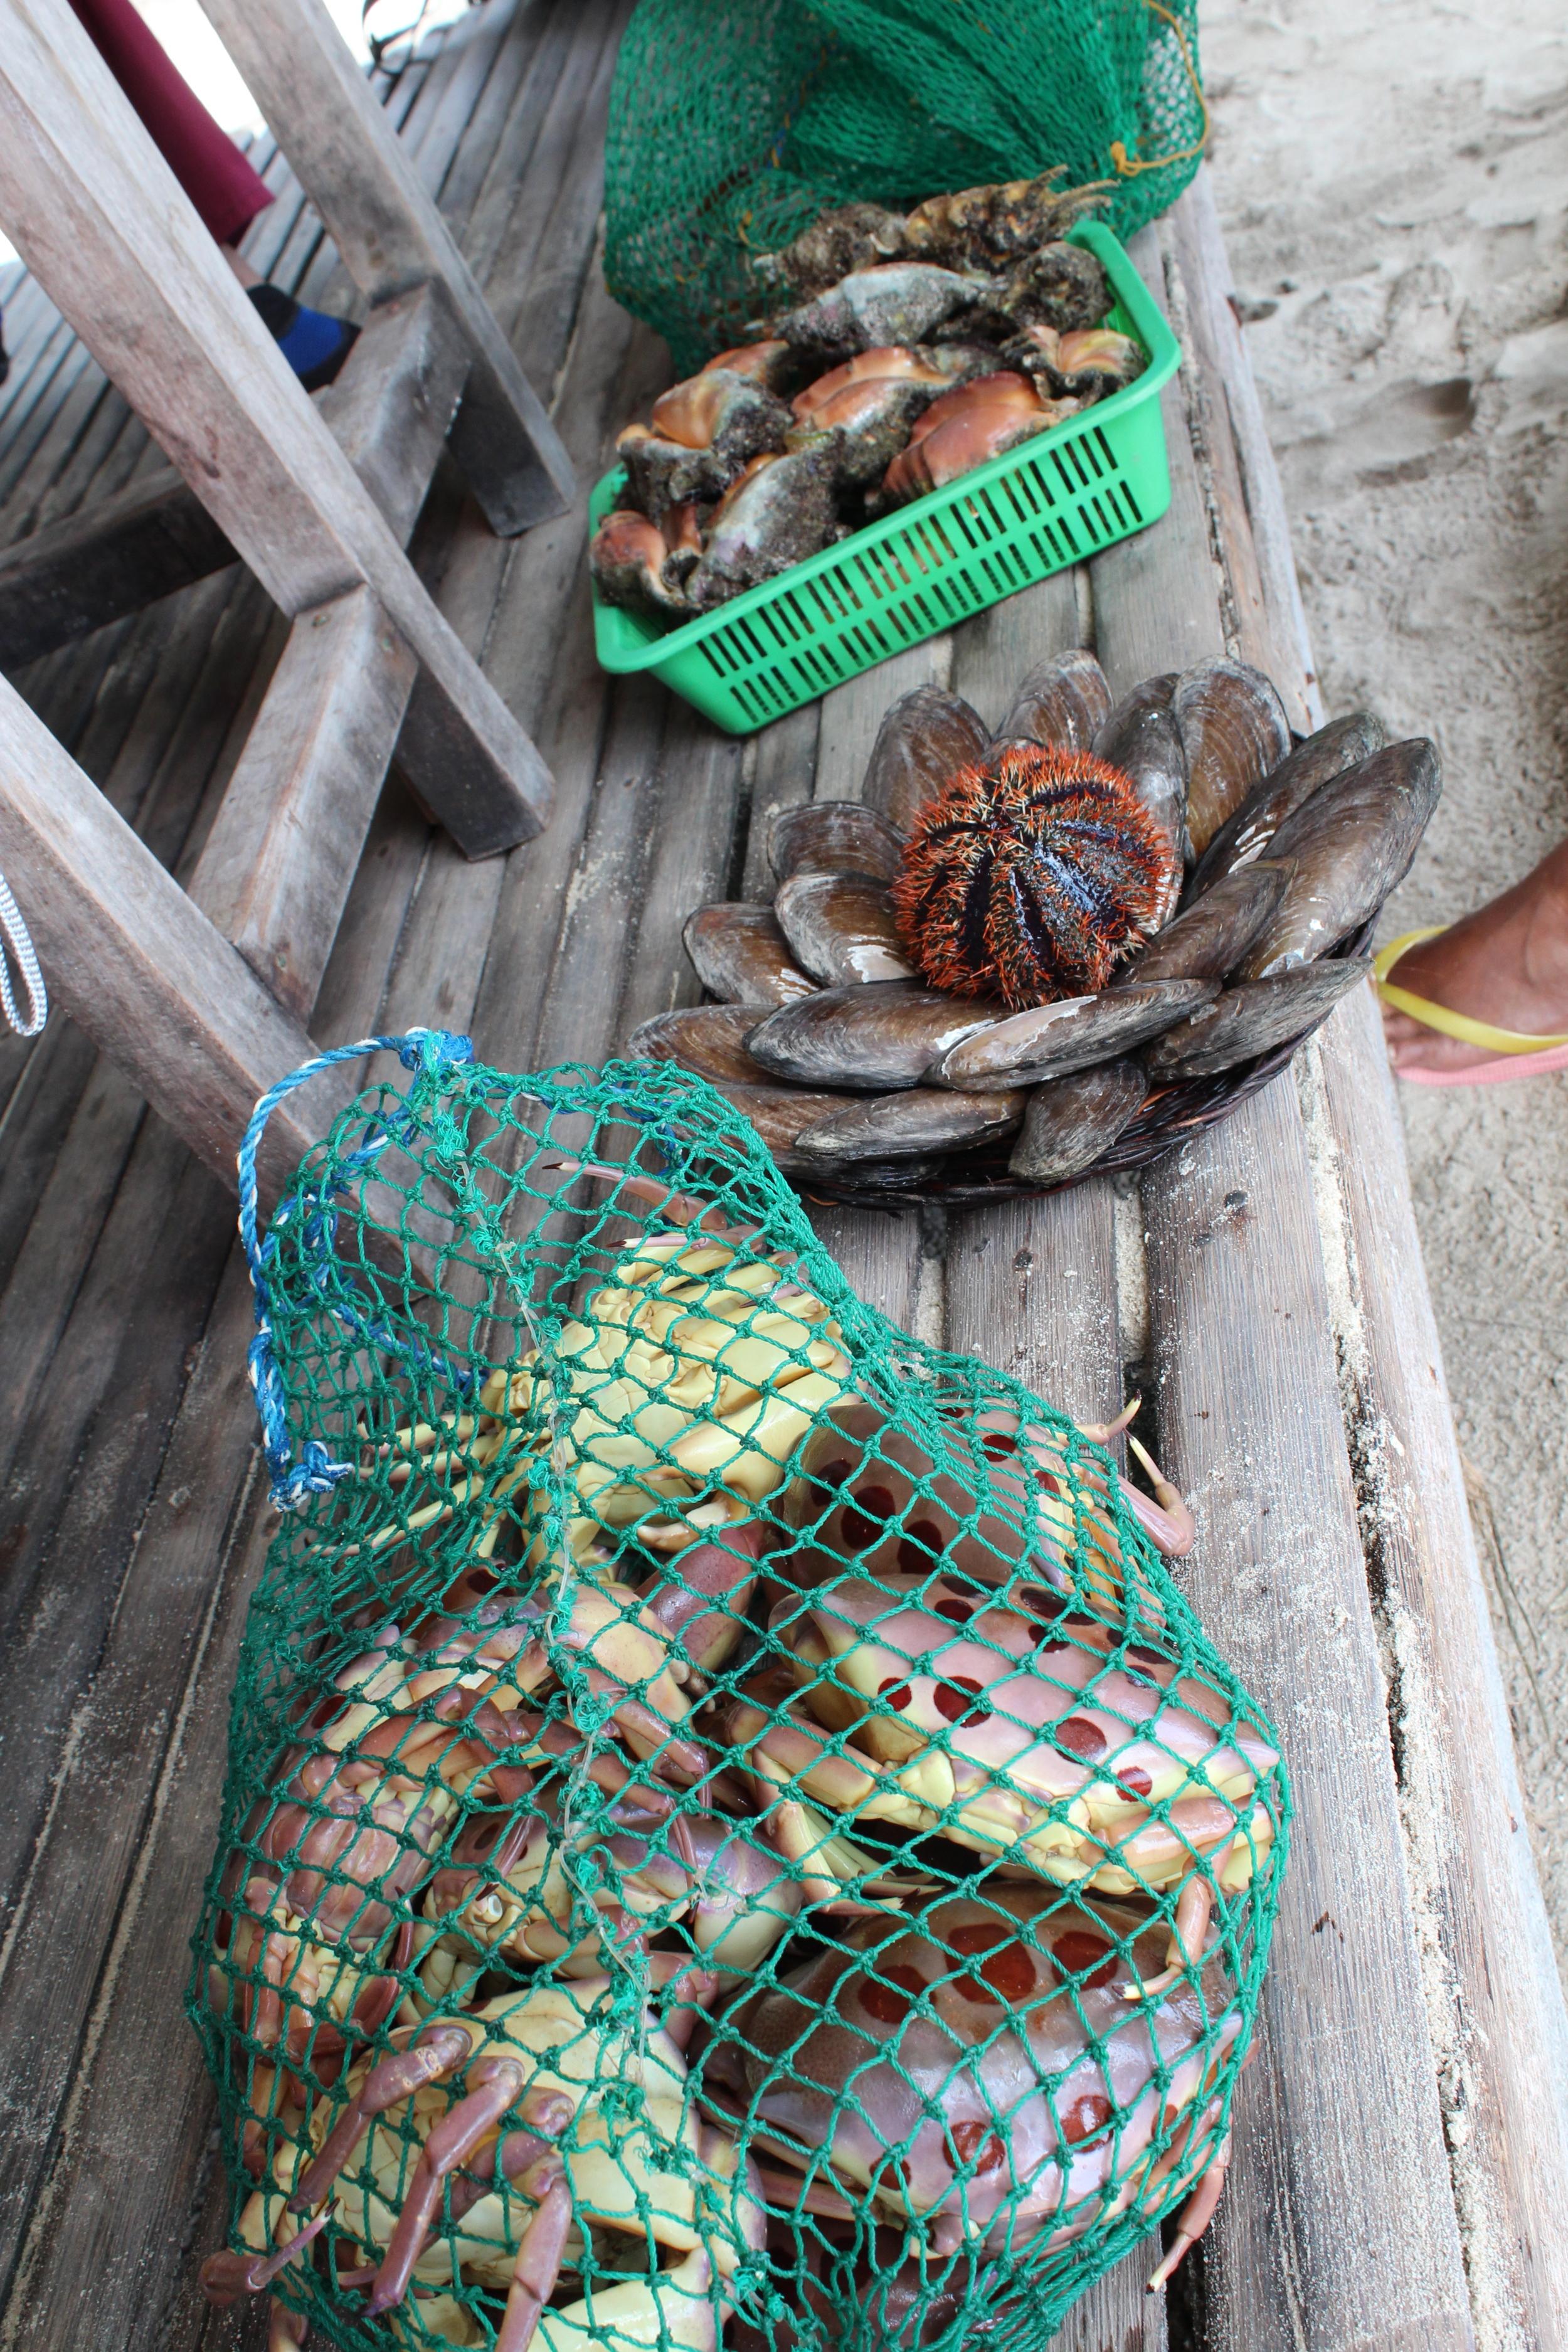 Street food vendor, Palawan style!